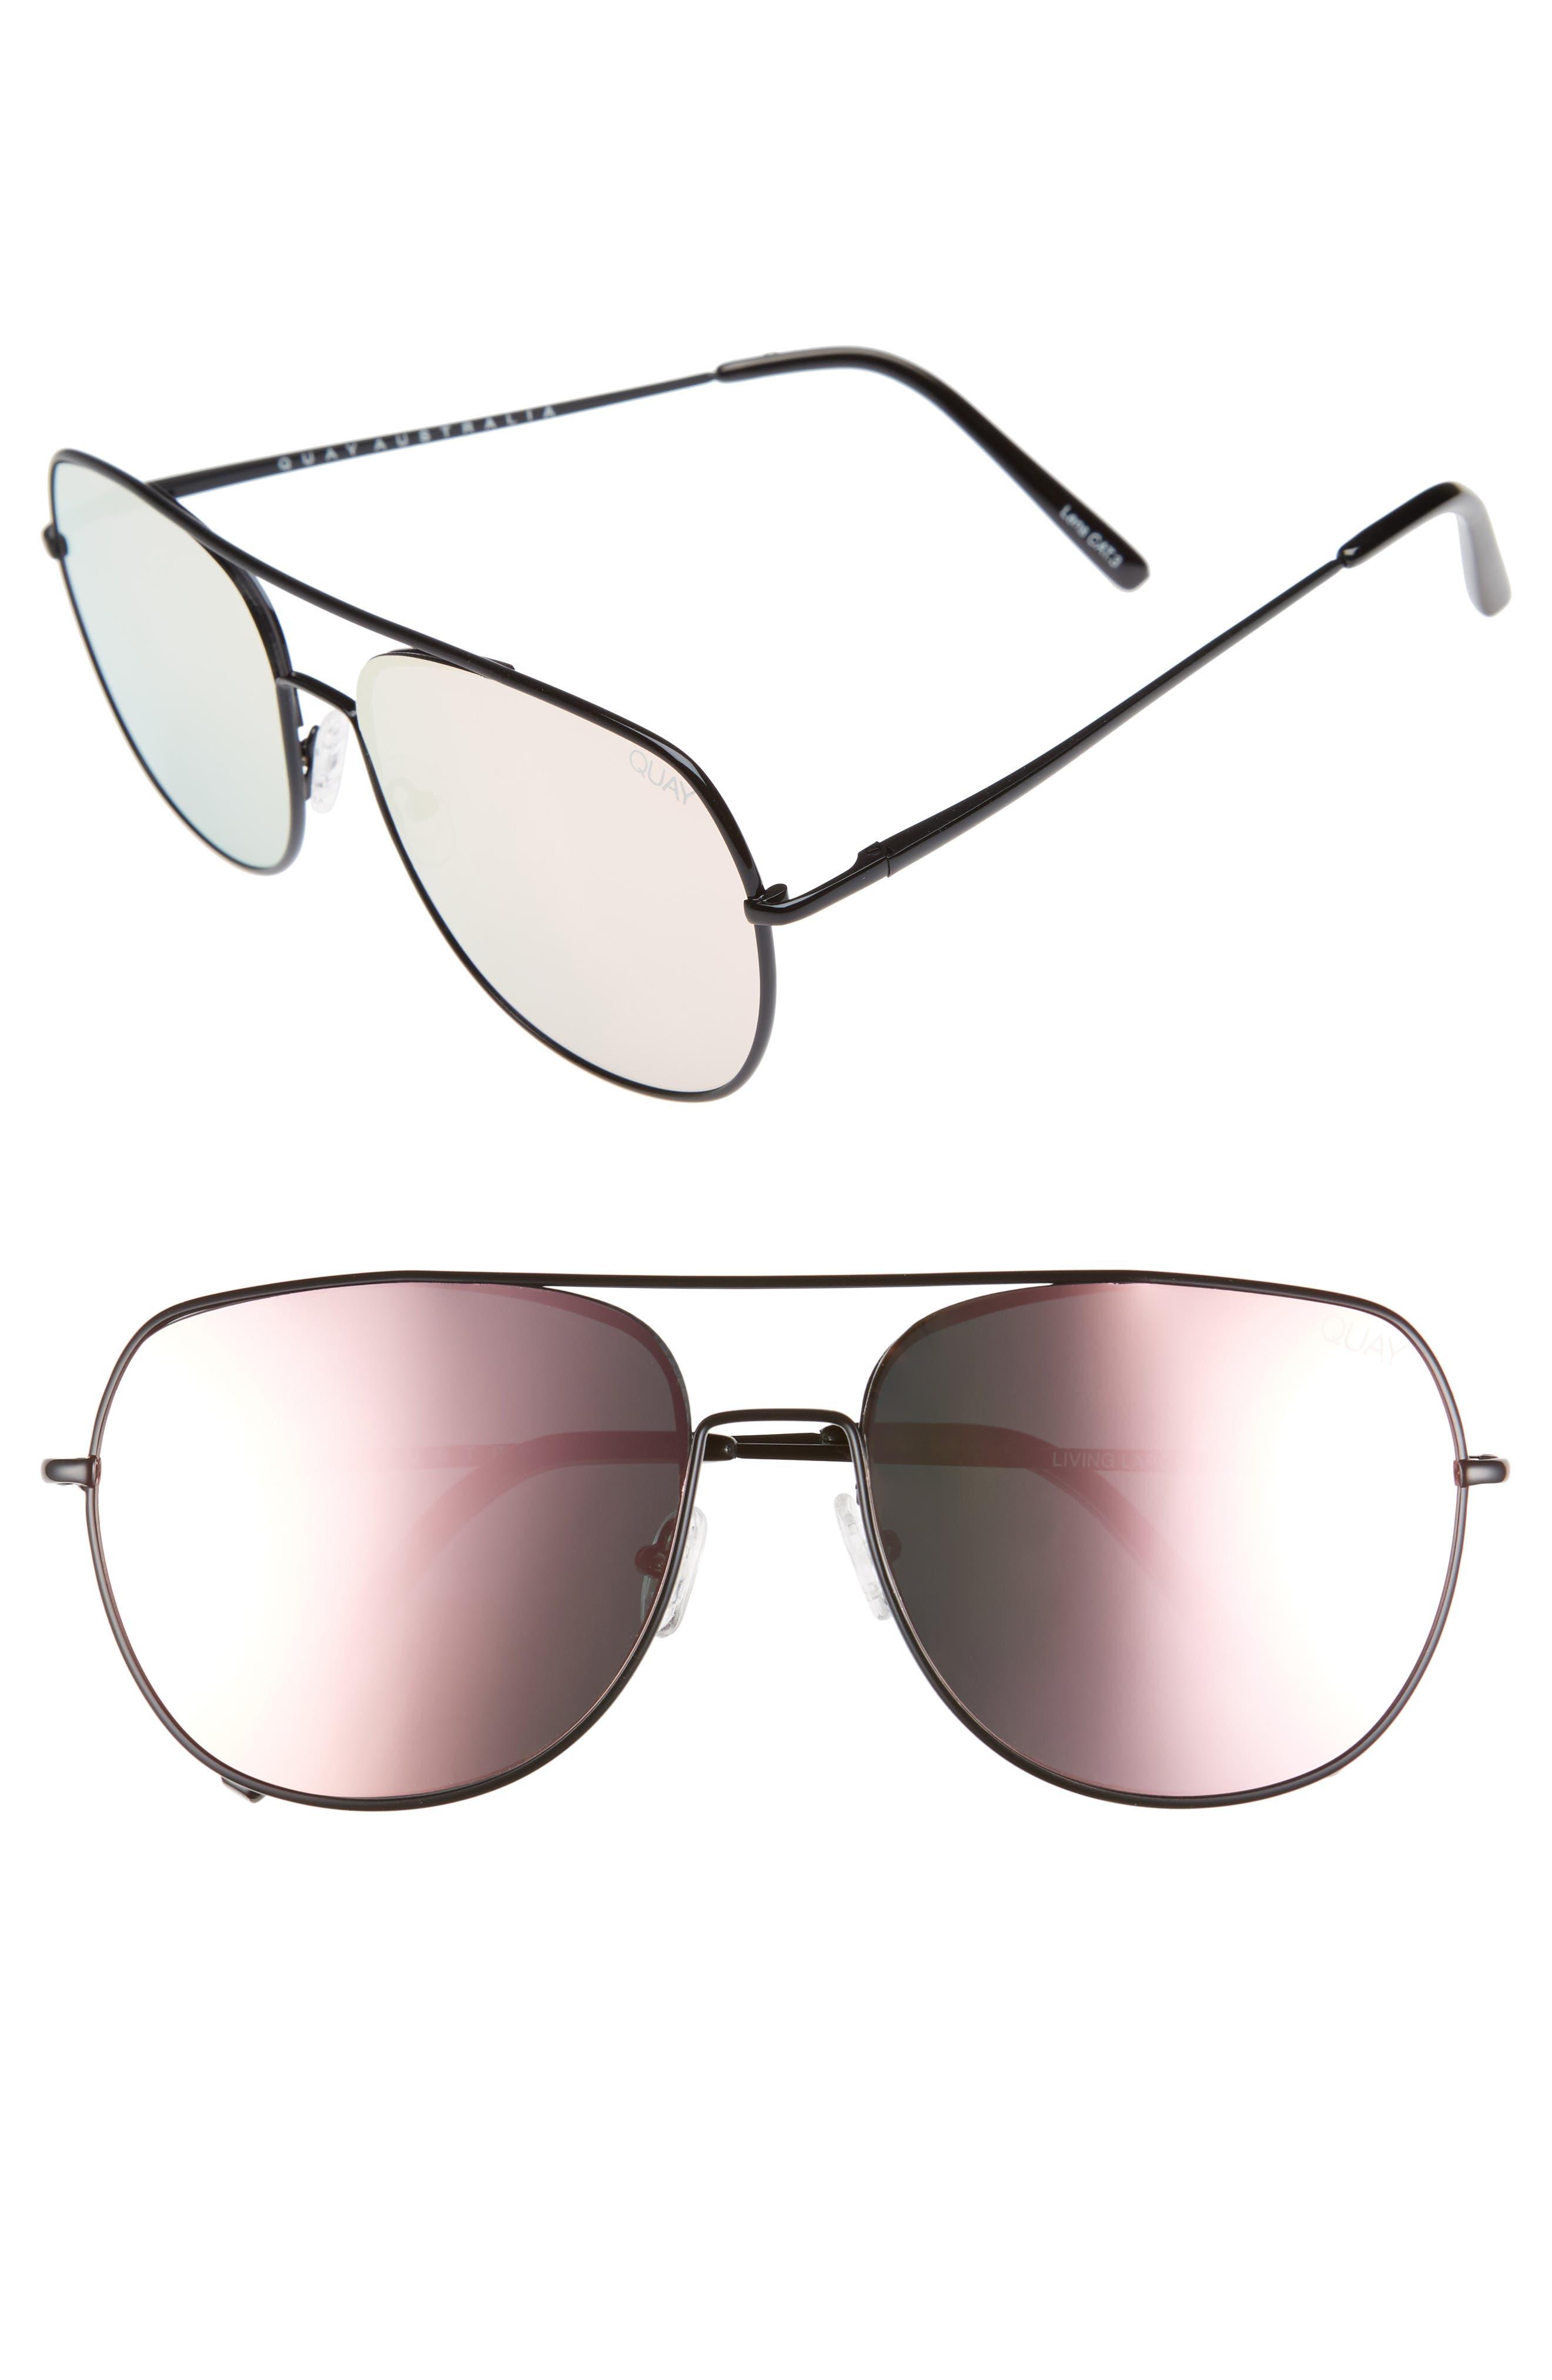 QUAY AUSTRALIA Living Large 60mm Mirrored Aviator Sunglasses